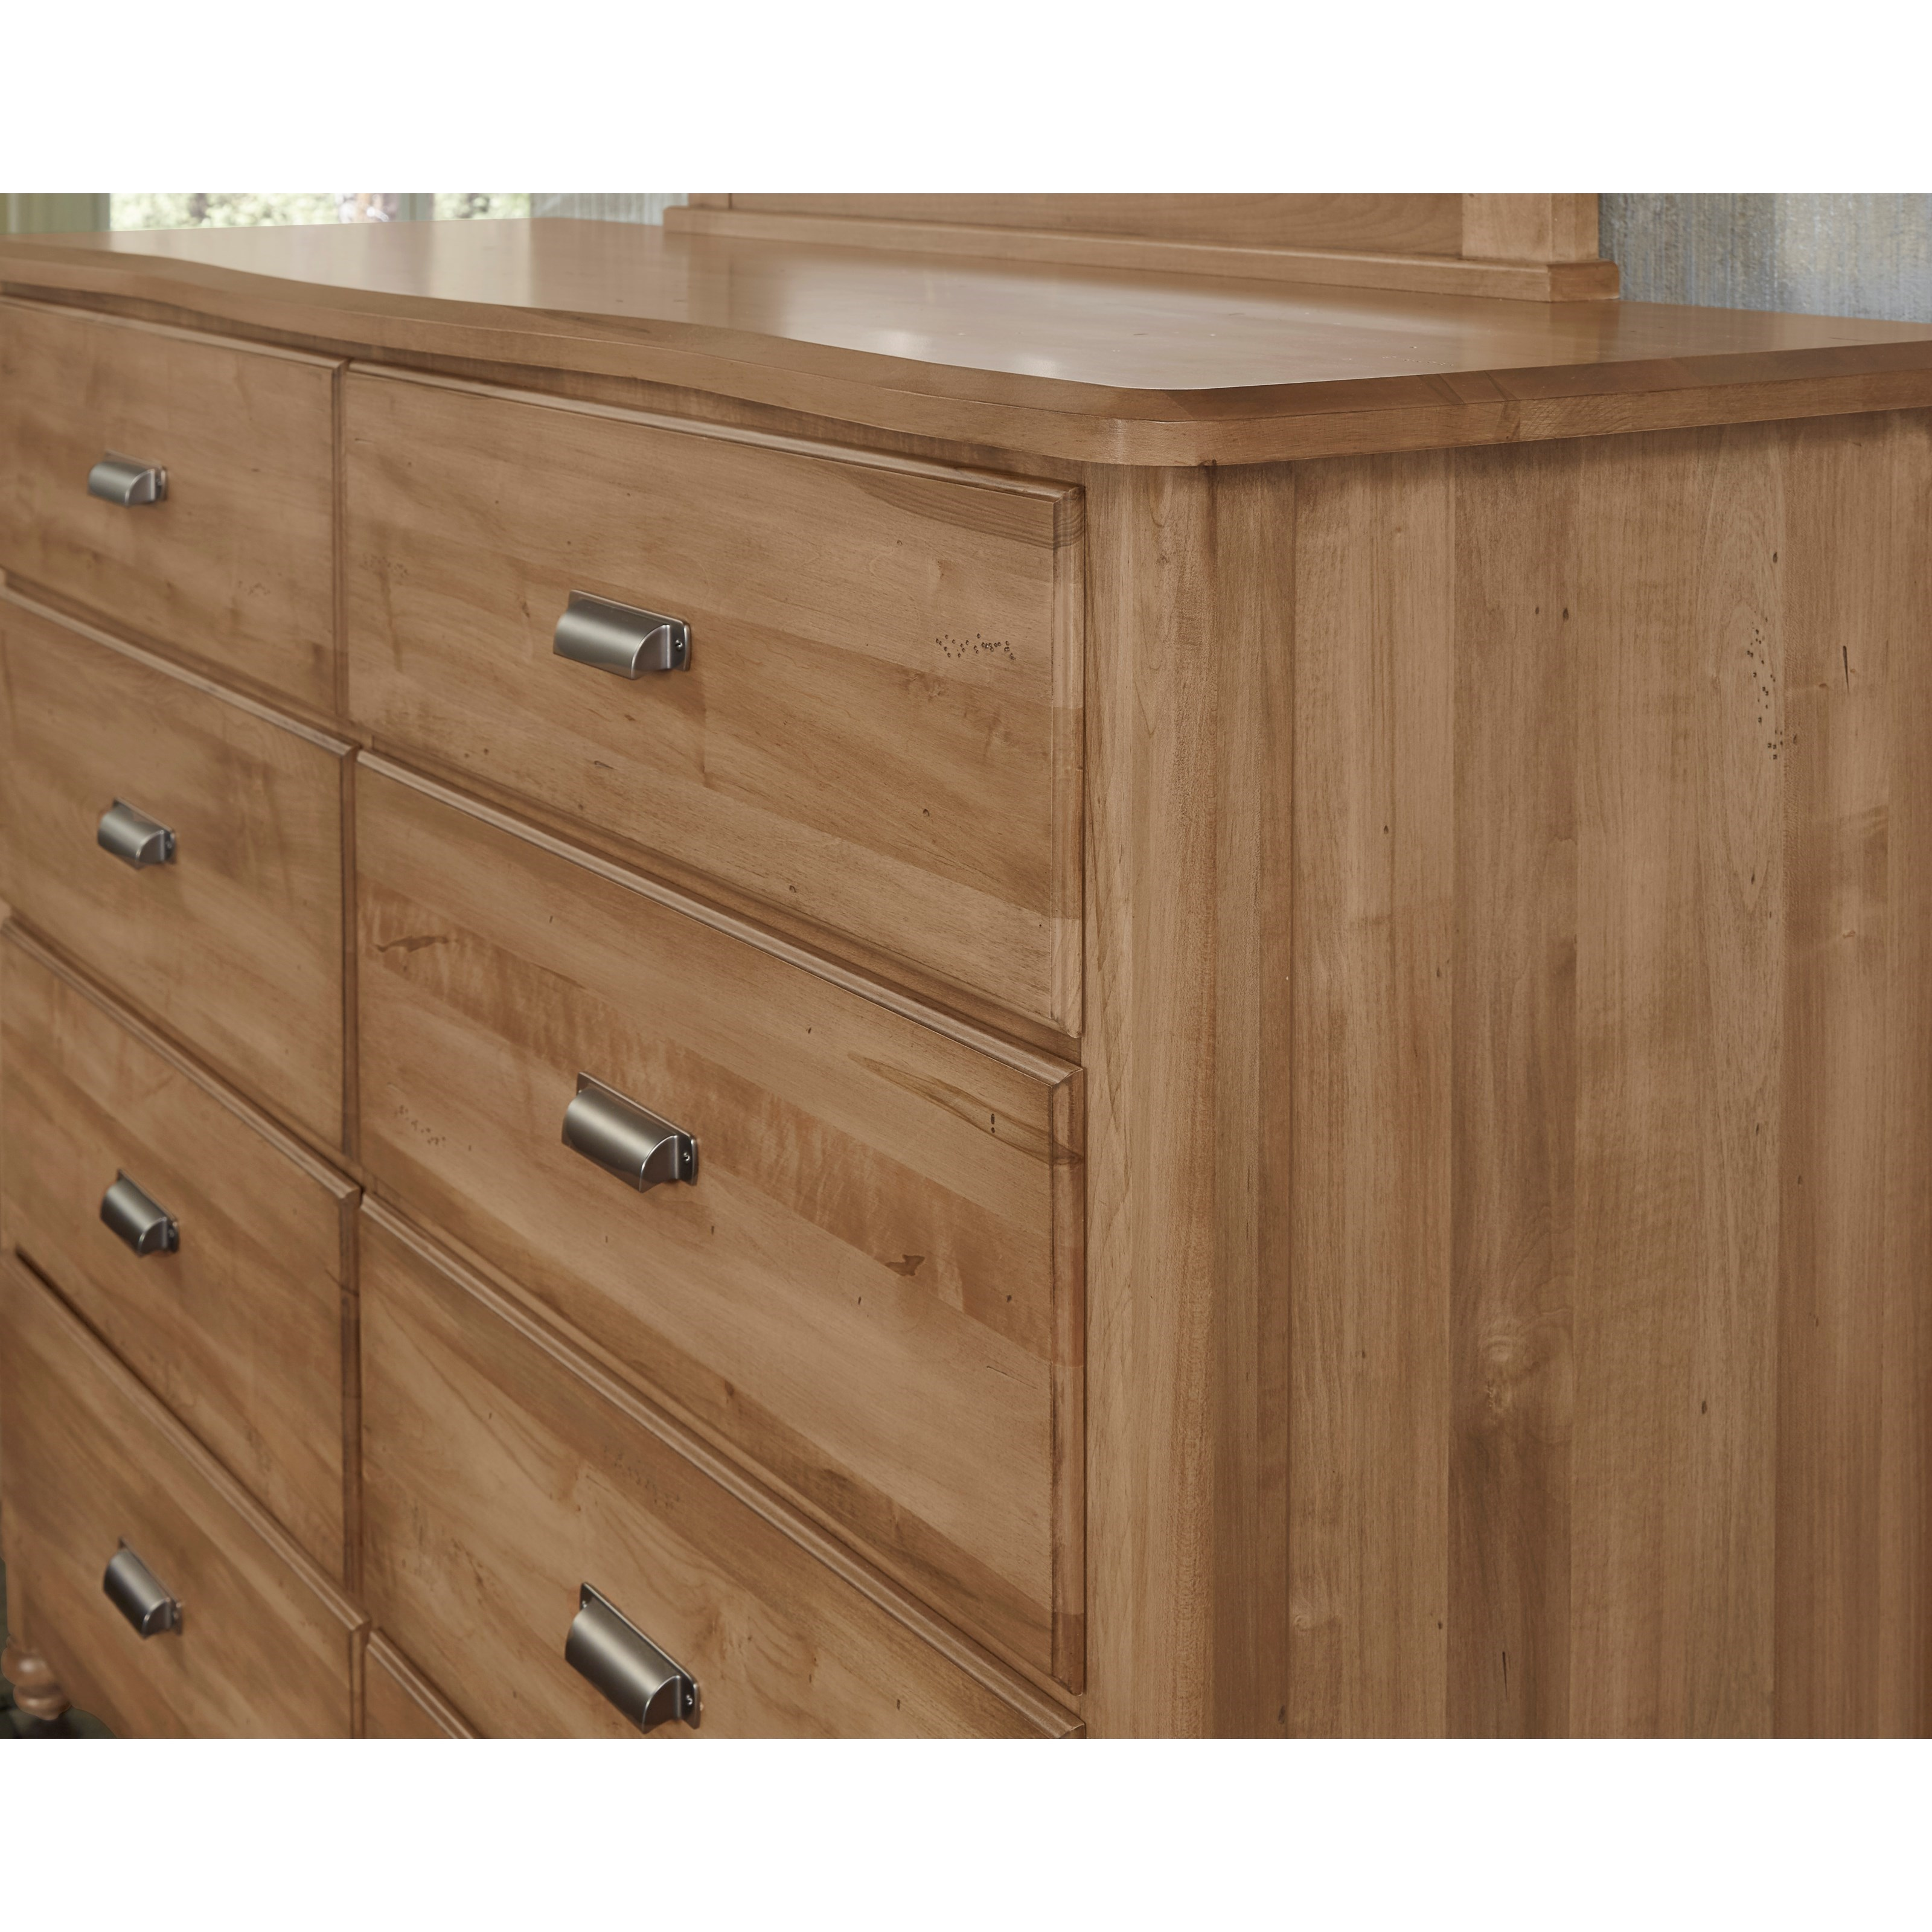 Bassett Furniture Milford Ct: Vaughan Bassett American Maple 402-004 Solid Wood Bureau